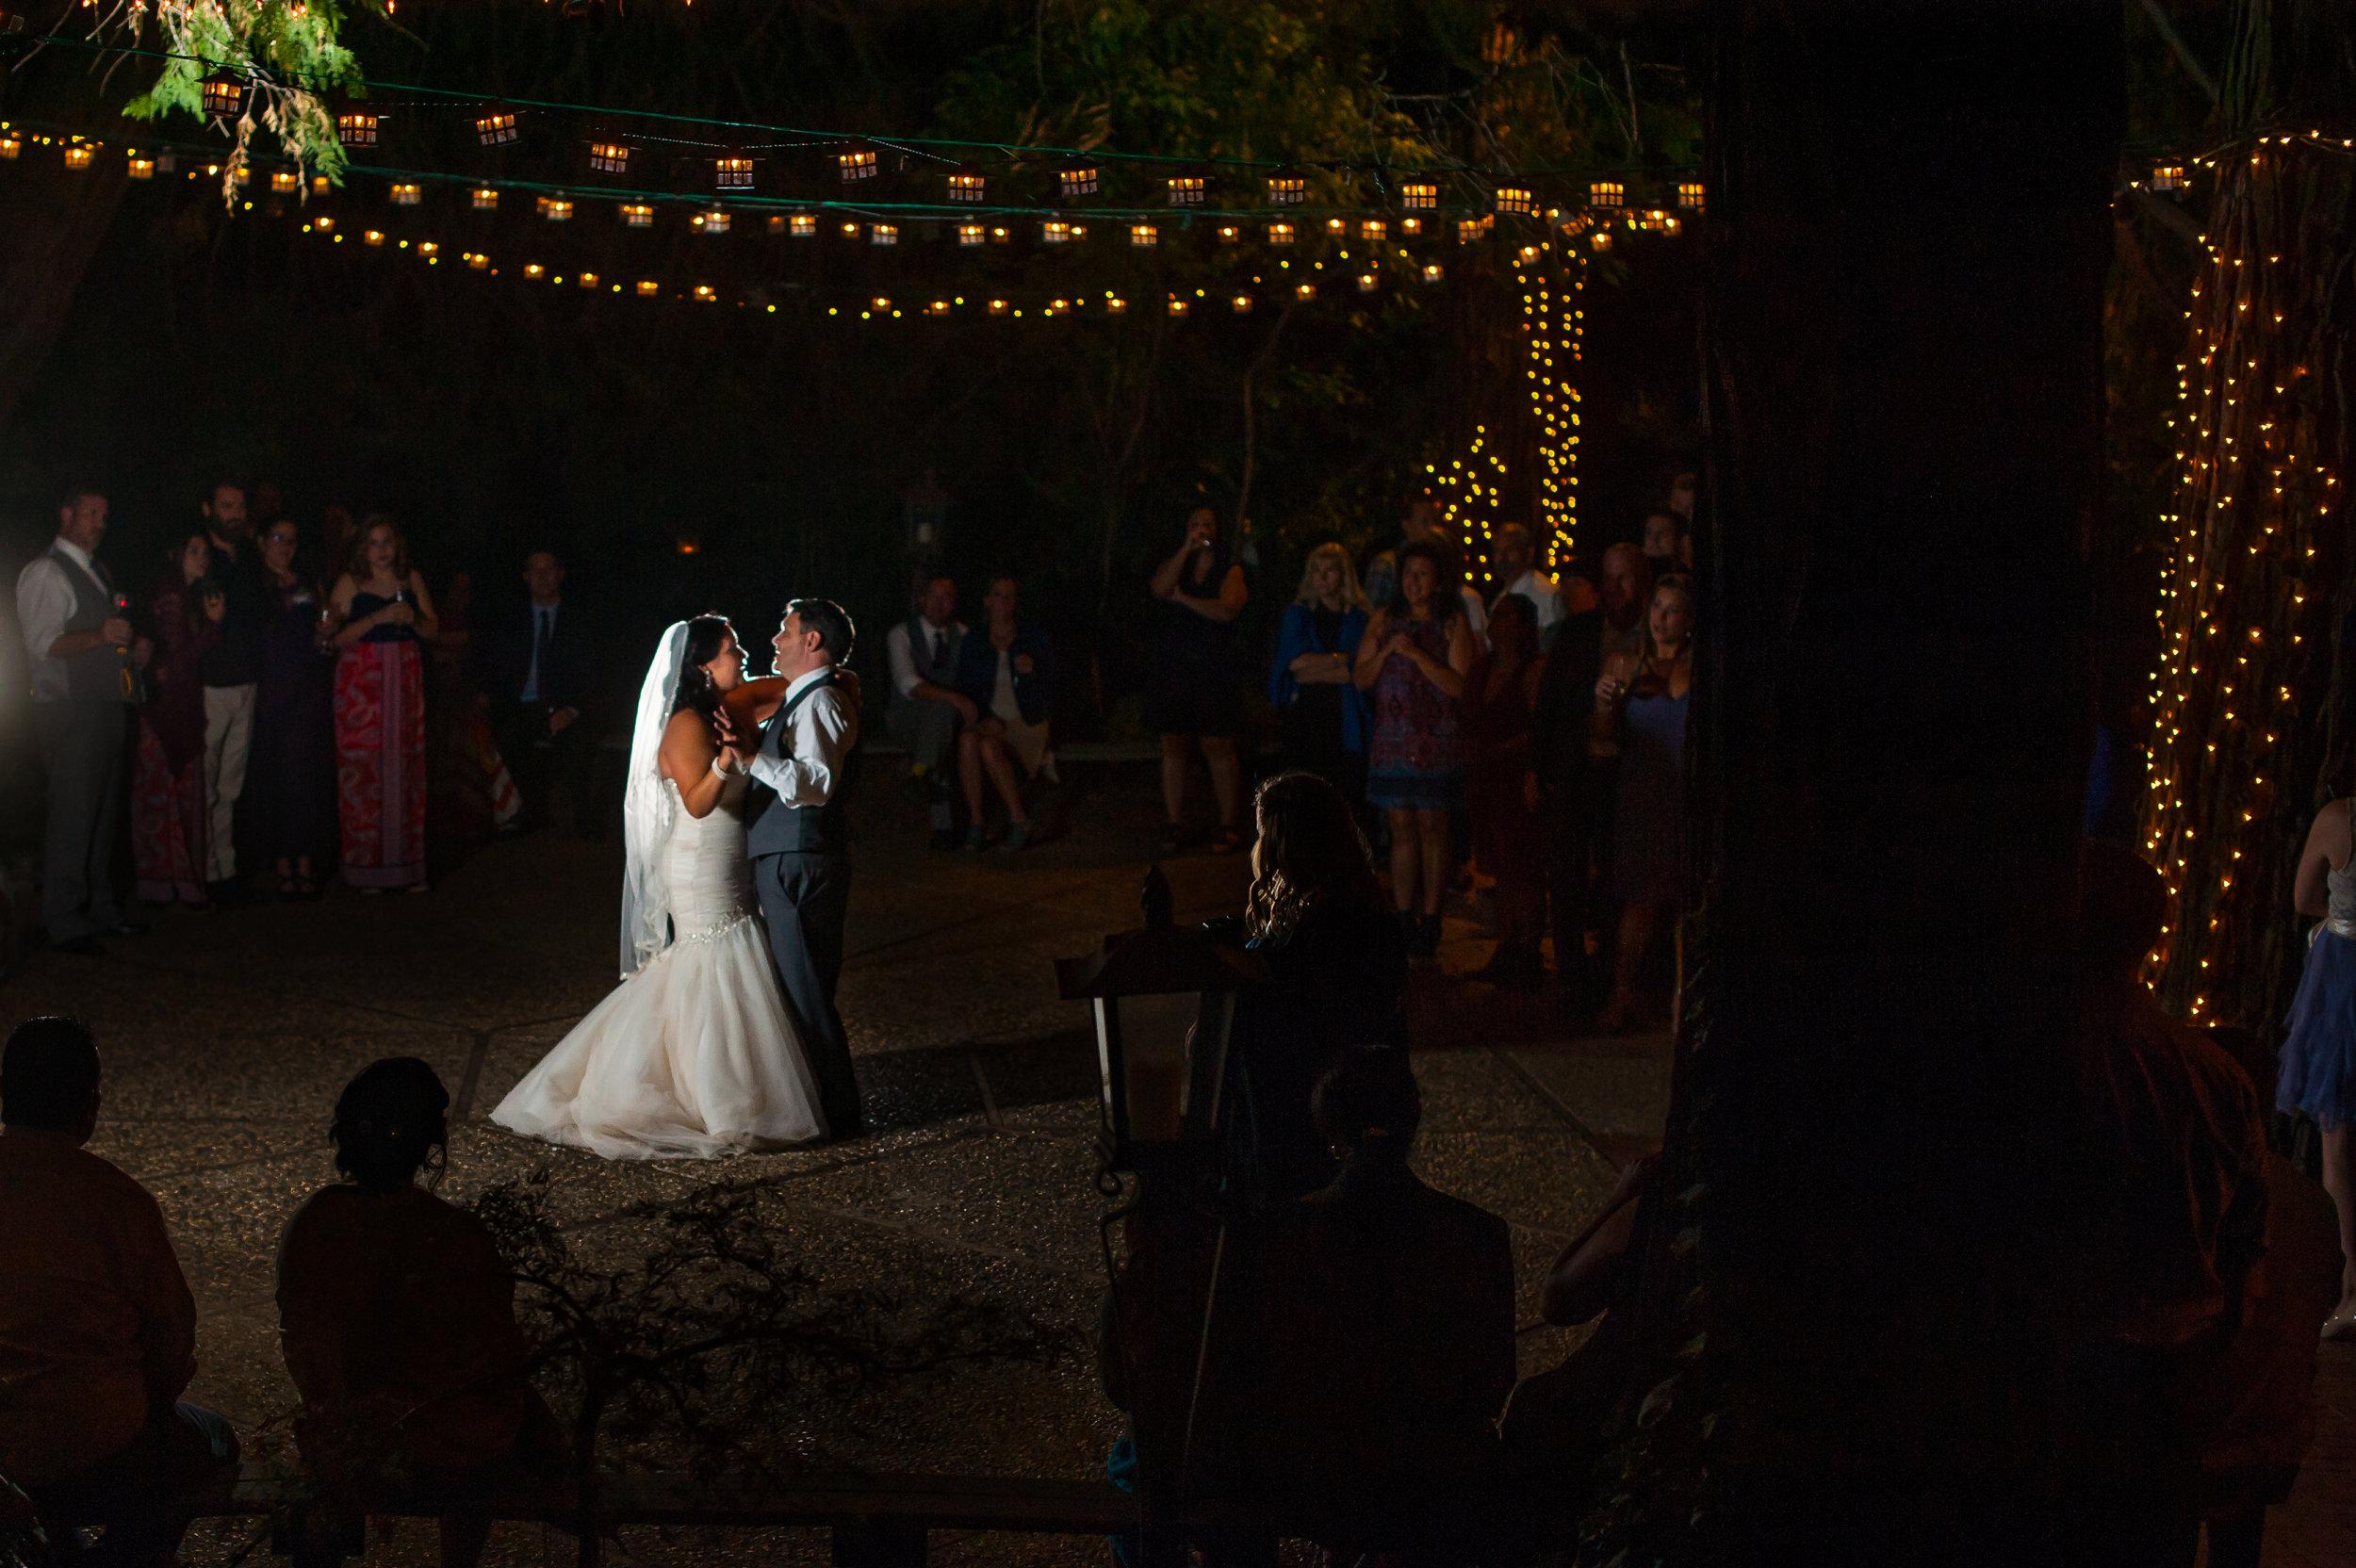 erika-seth-036-monte-verde-inn-sacramento-wedding-photographer-katherine-nicole-photography.JPG